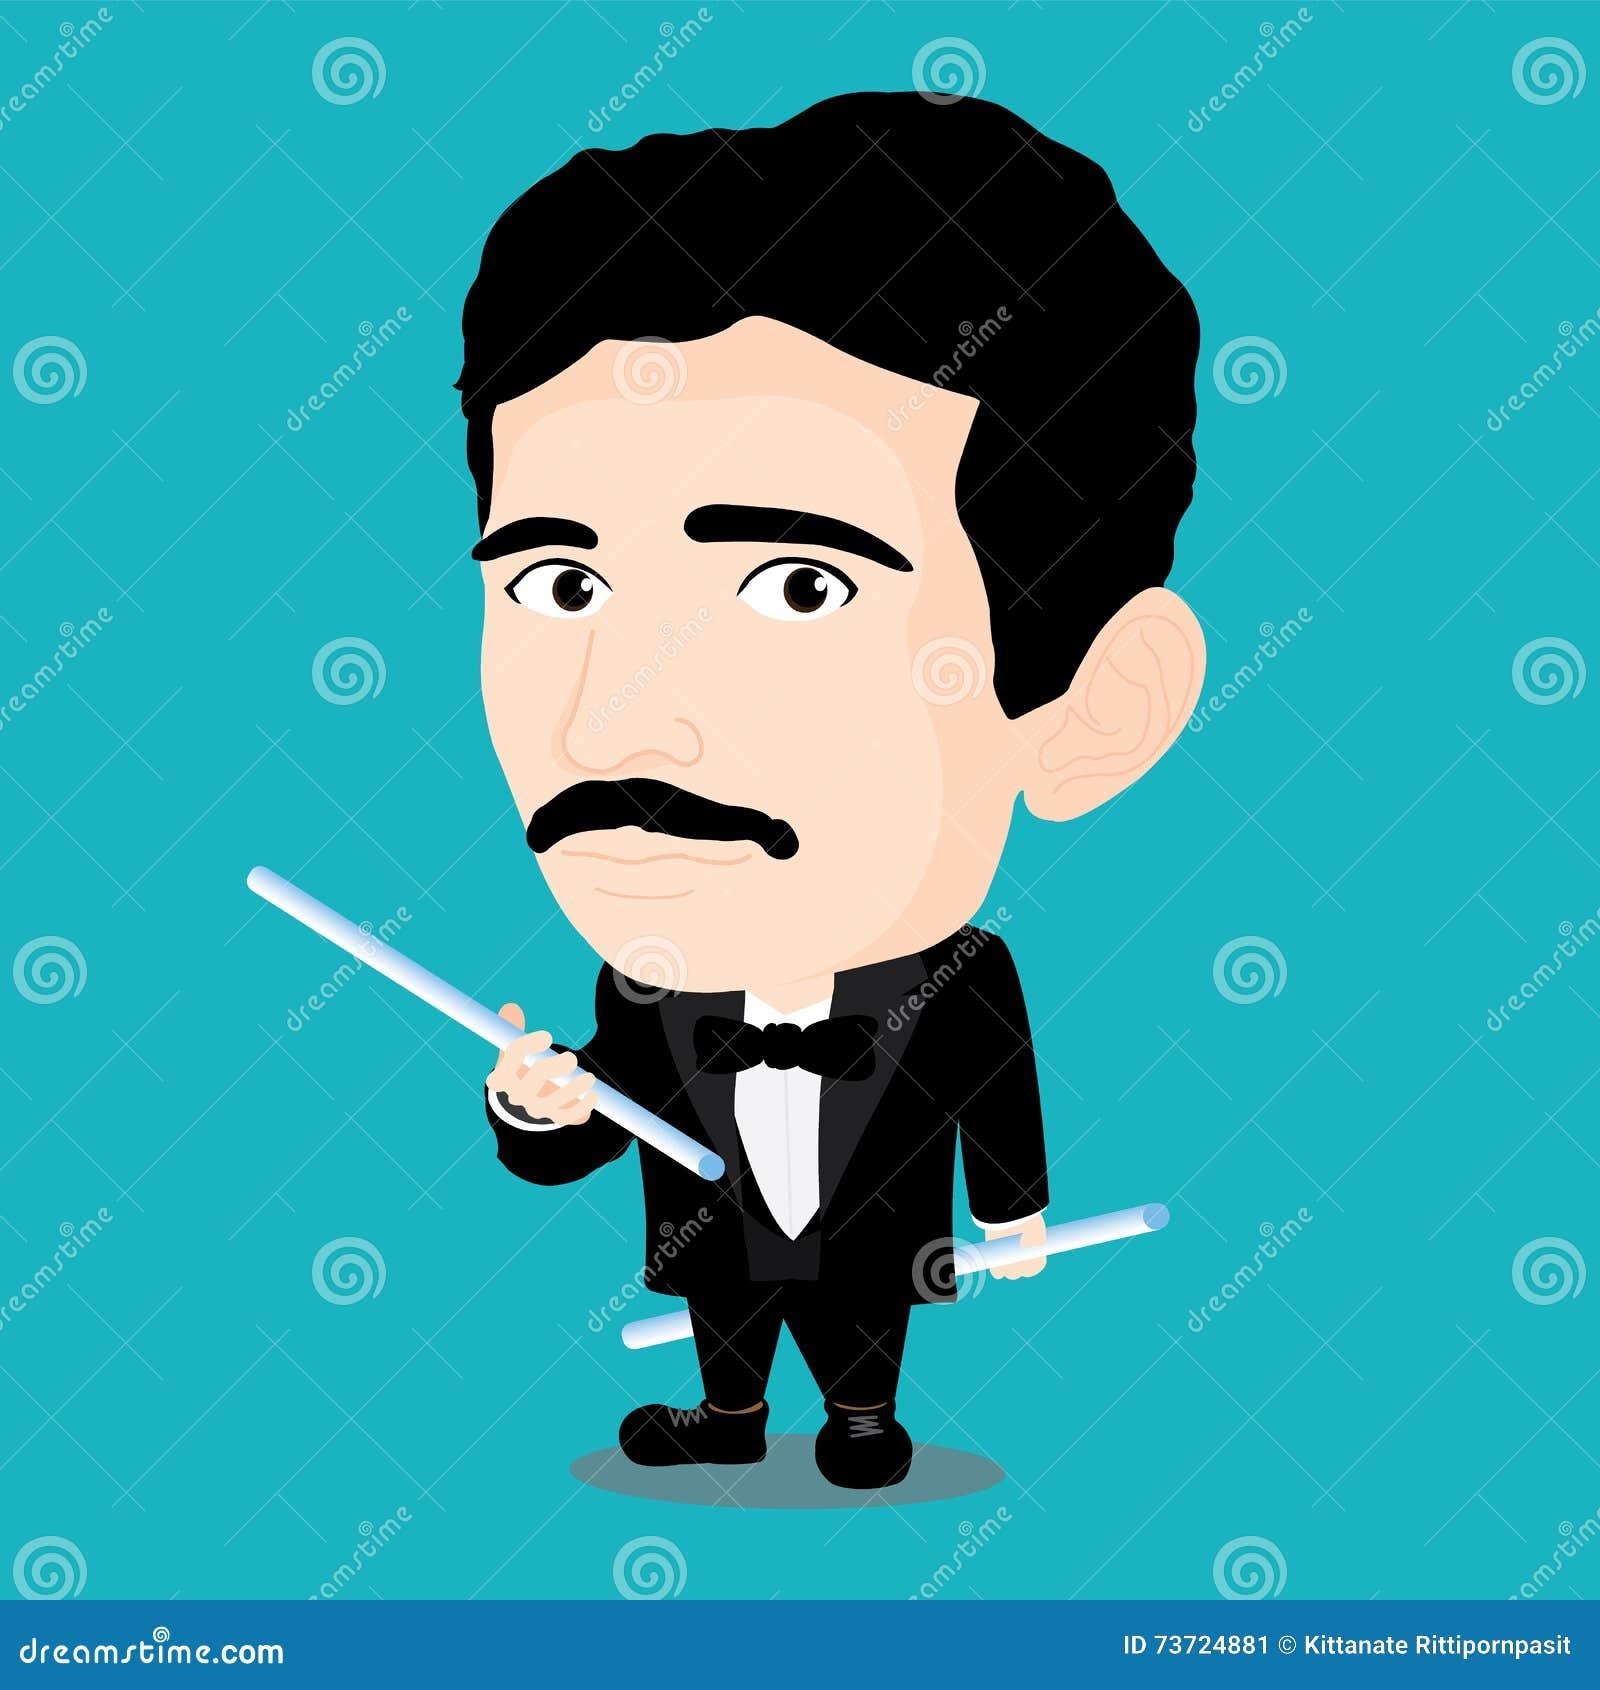 Nikola Tesla Character Stock Vector Illustration Of